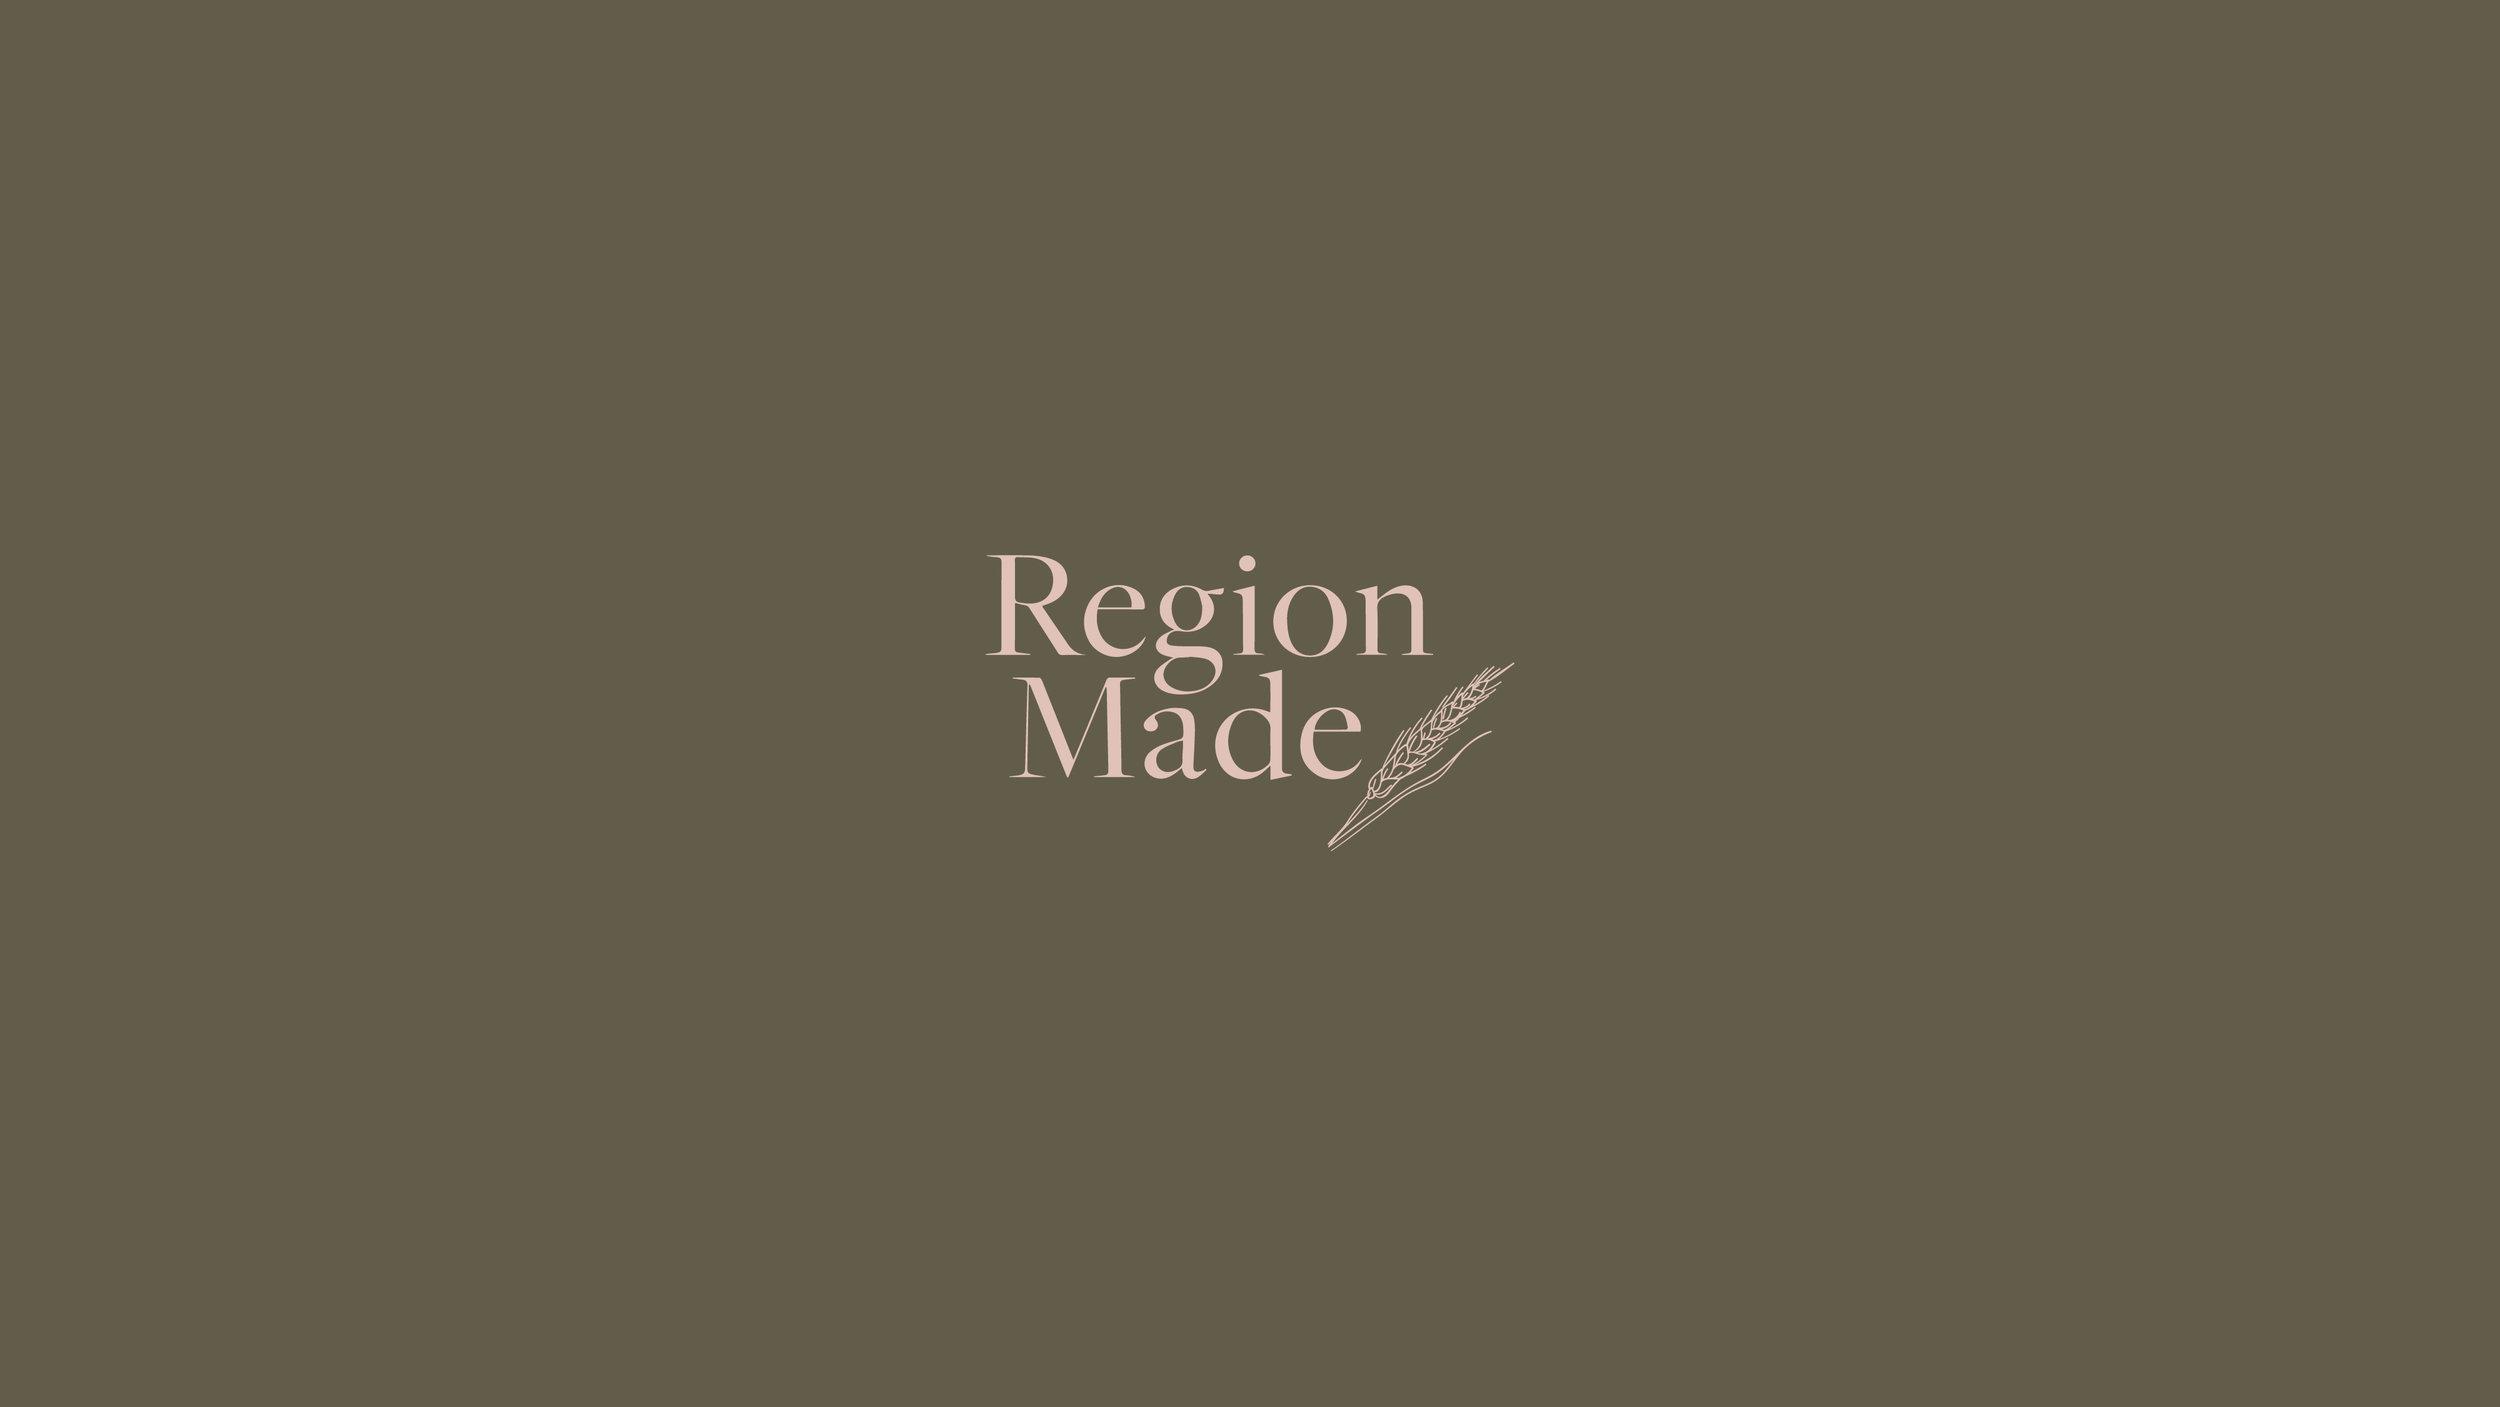 RM clr_logo 2 copy 3.jpg